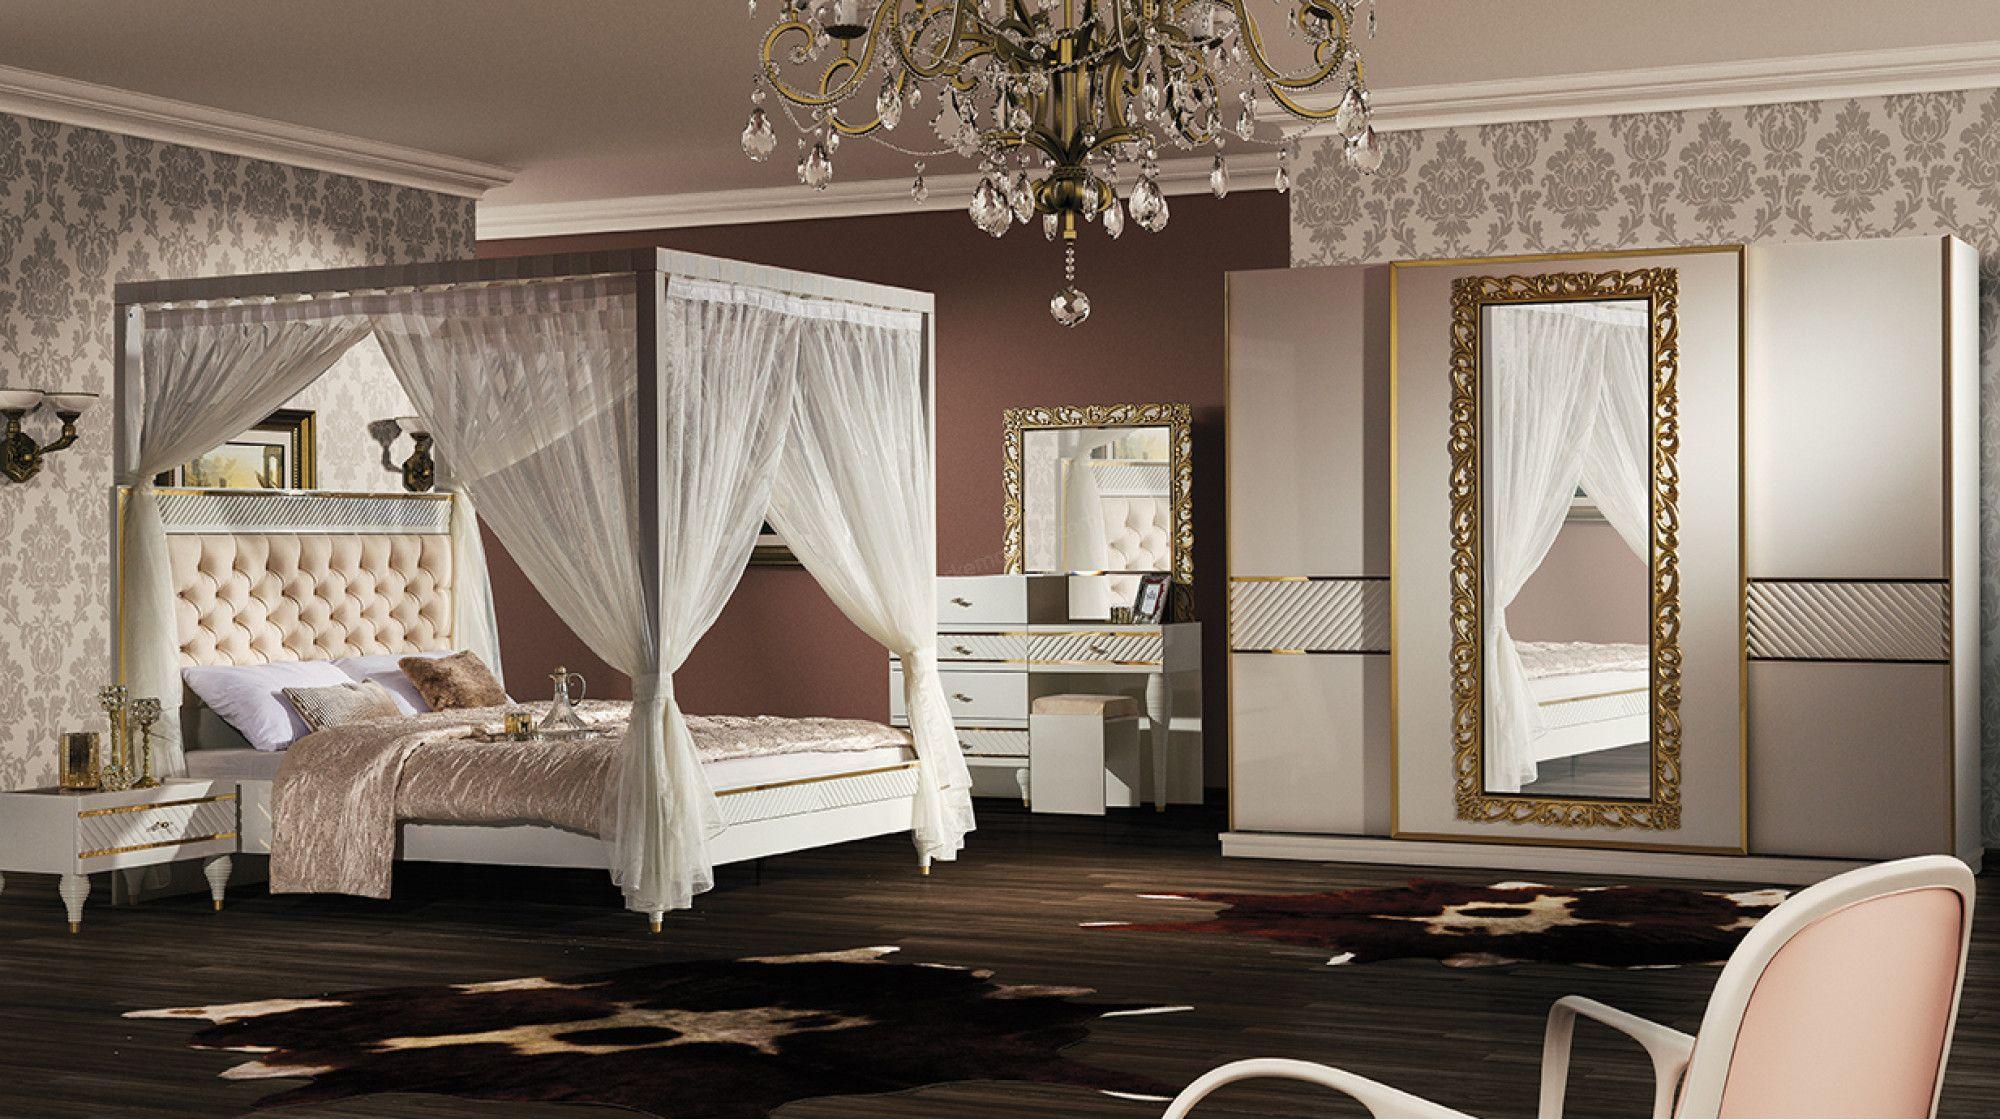 Enza home mobilya yatak odas modelleri 22 dekor sarayi - R Ya Avangard Yatak Odas Tak M